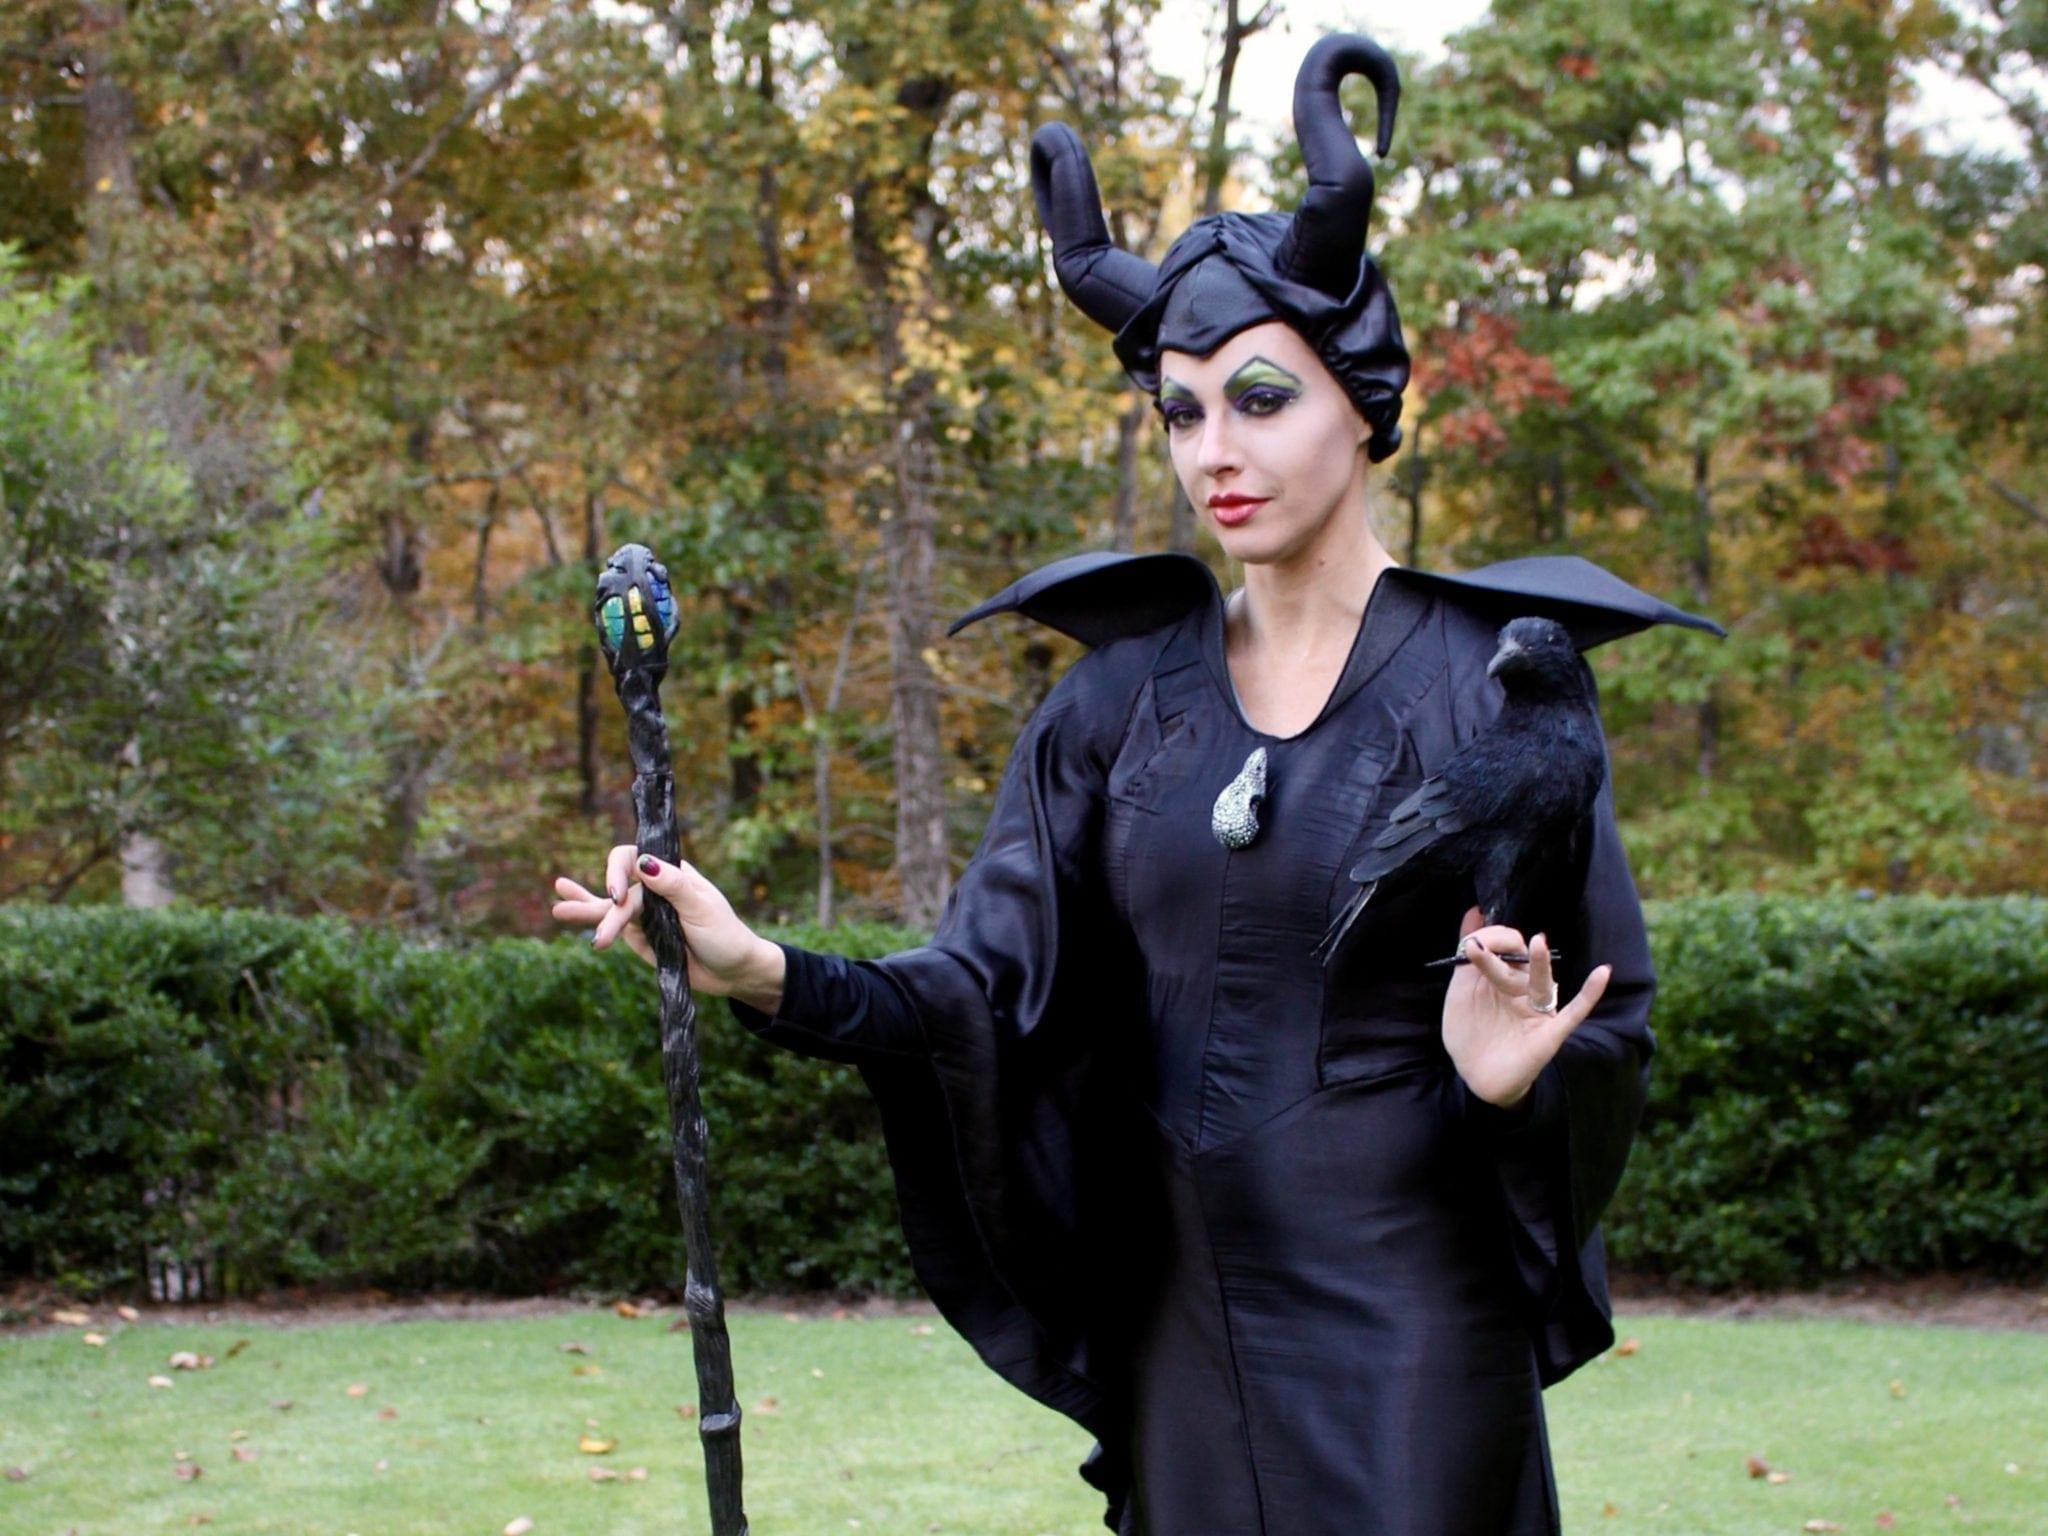 Cheap maleficent halloween costume